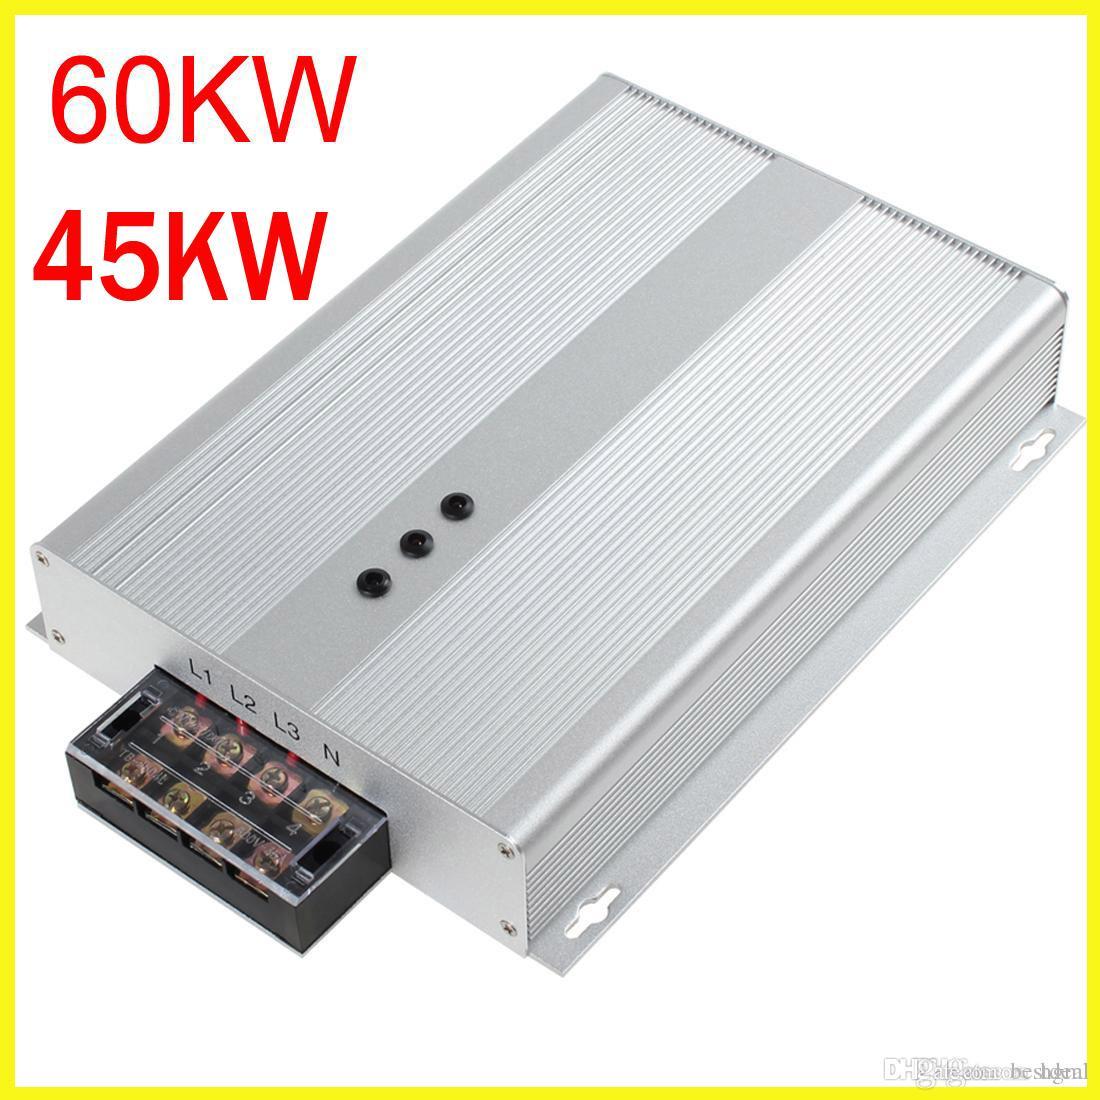 US EU UK Stecker 45KW / 60KW Intelliworks Energy Savers Energiesparmodus Dreiphasen-Energiesparbox AC 90-400V Energieeinsparung 35% EGS1B0